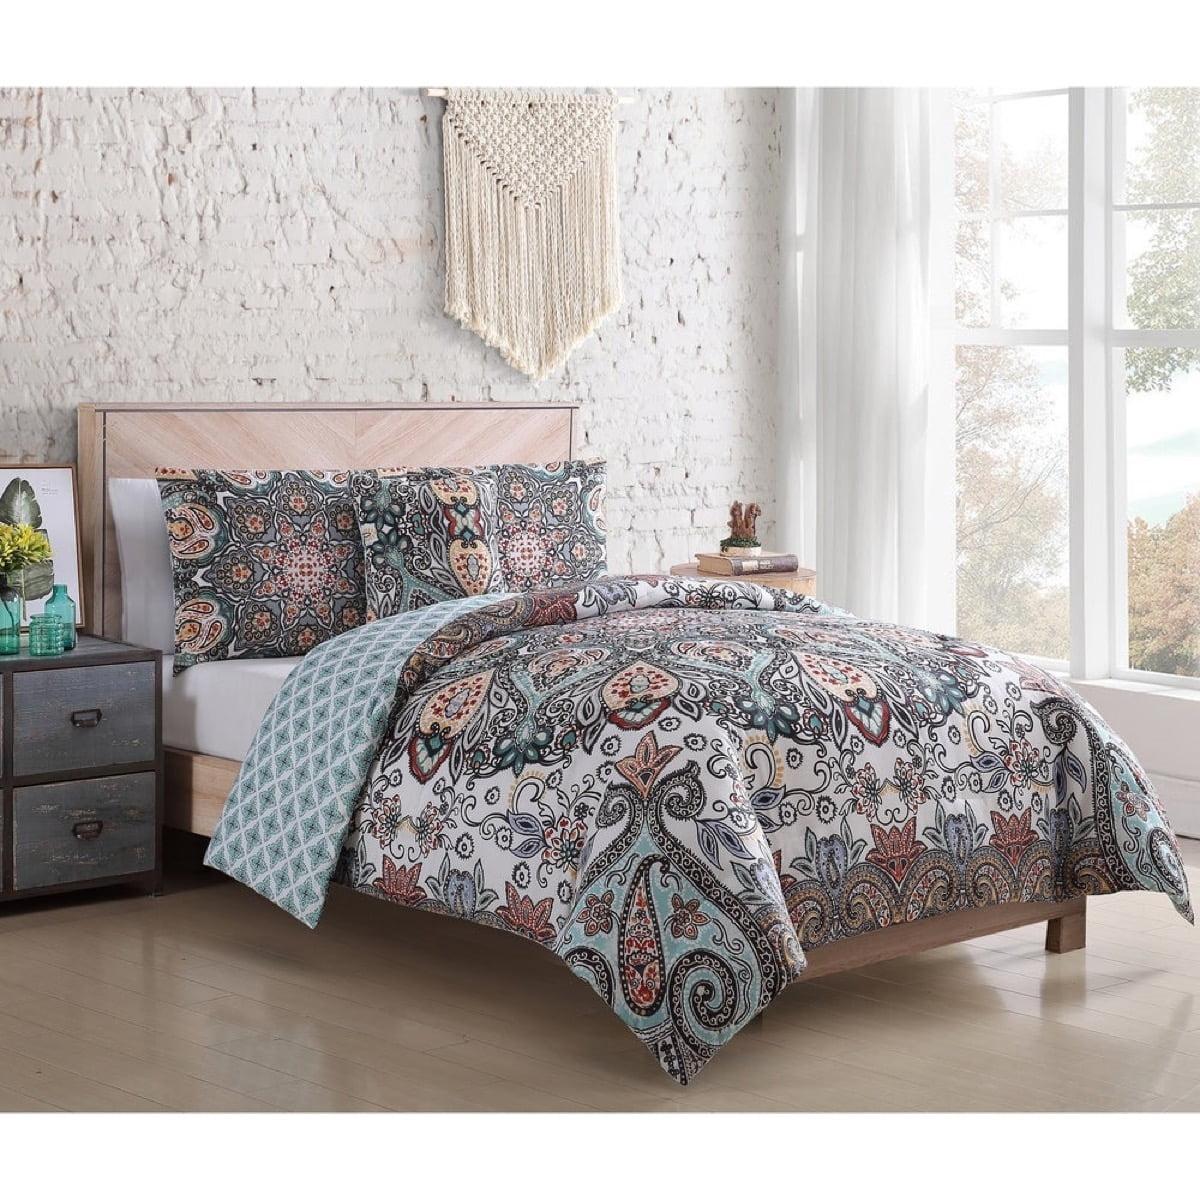 رختخواب سبک بوهو - 10. الگوی بته جقه